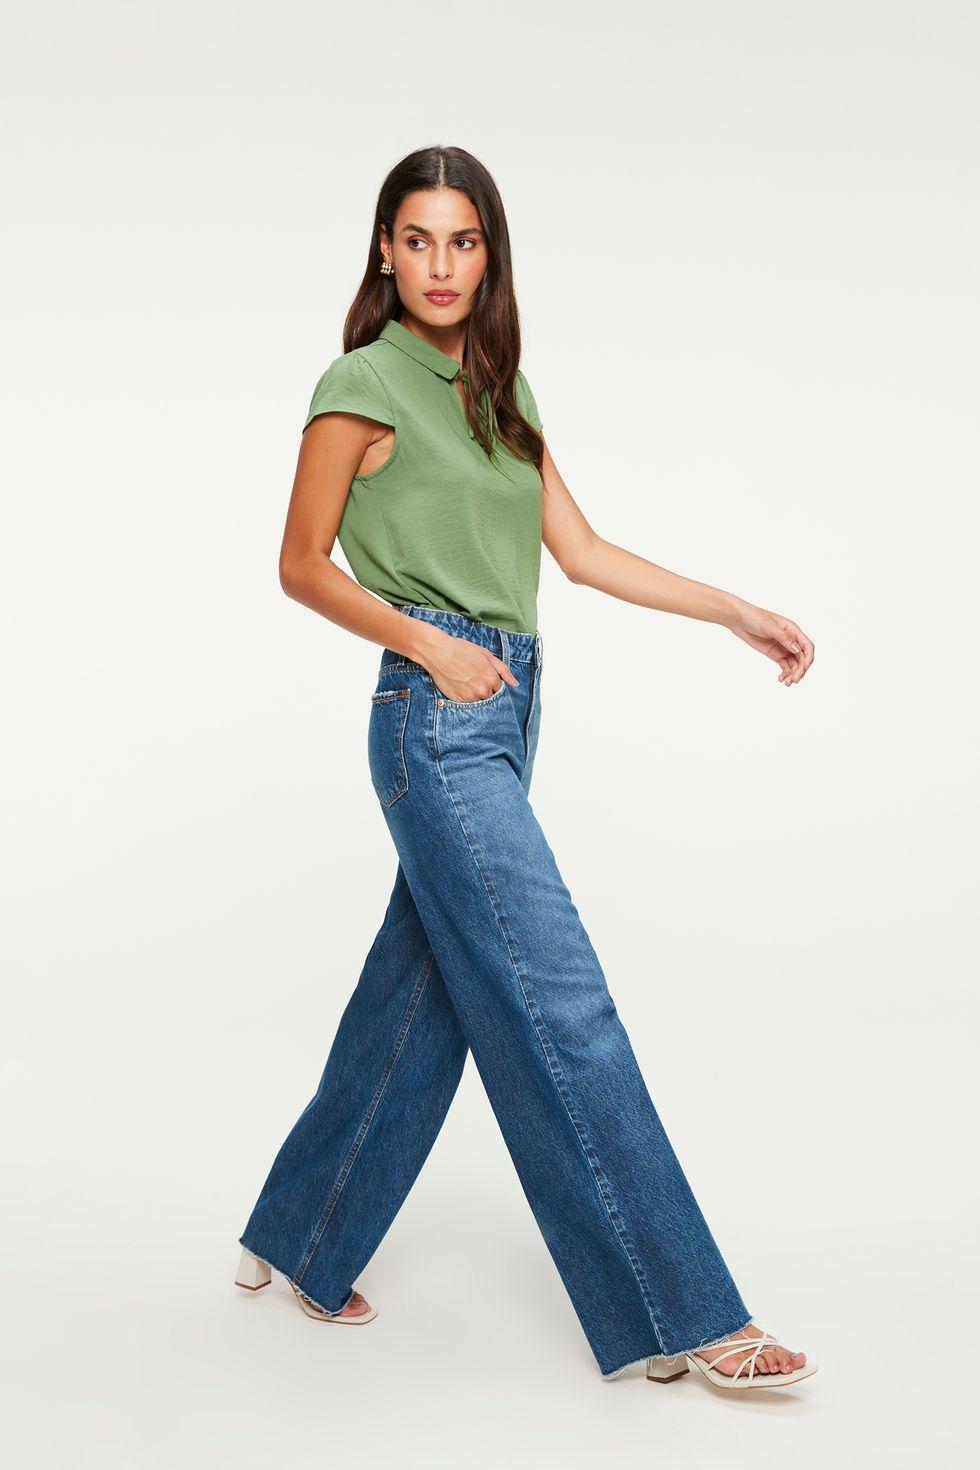 Calça Jeans Wide Leg Cintura Super Alta Tam: 44 / Cor: MEDIA